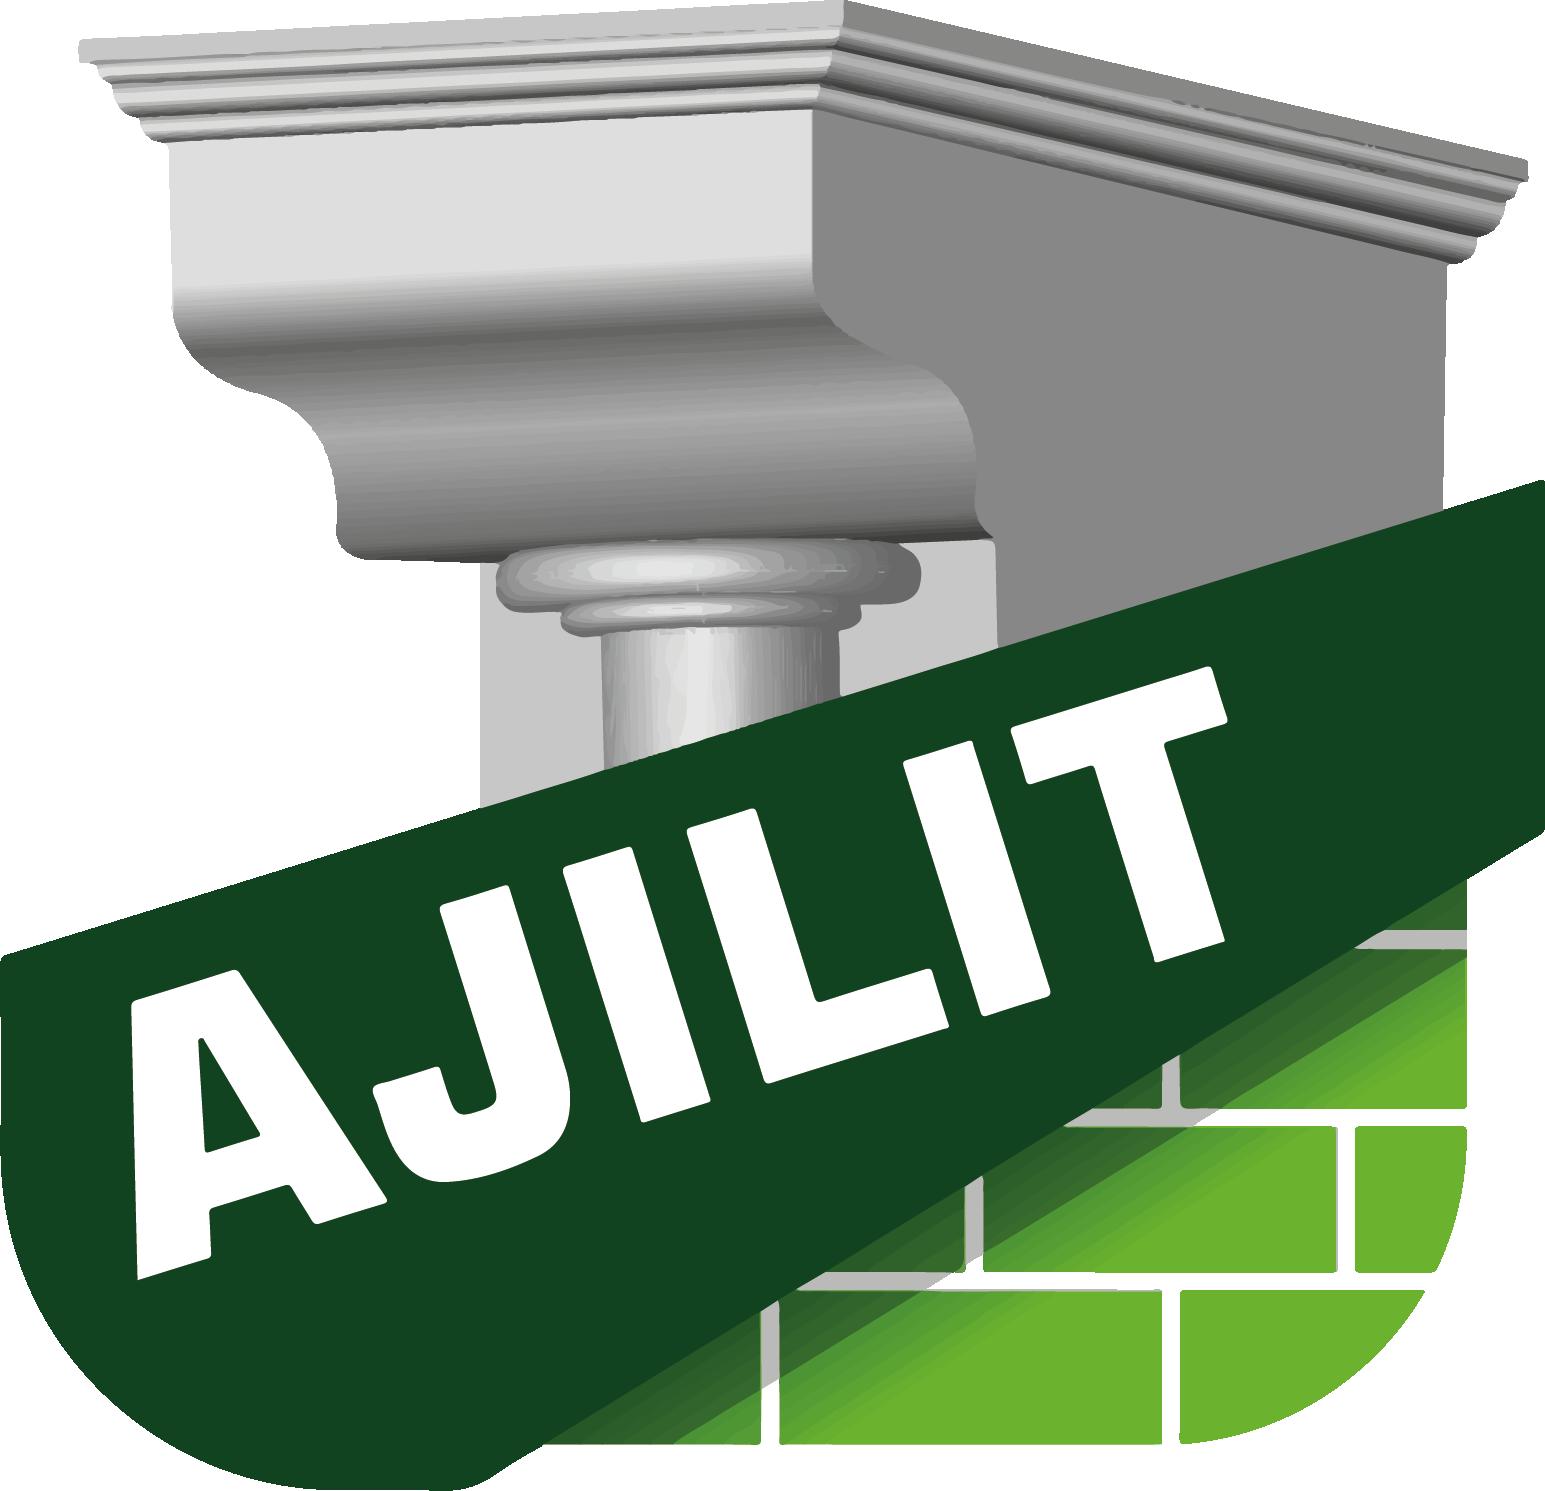 Ajilit logo icone